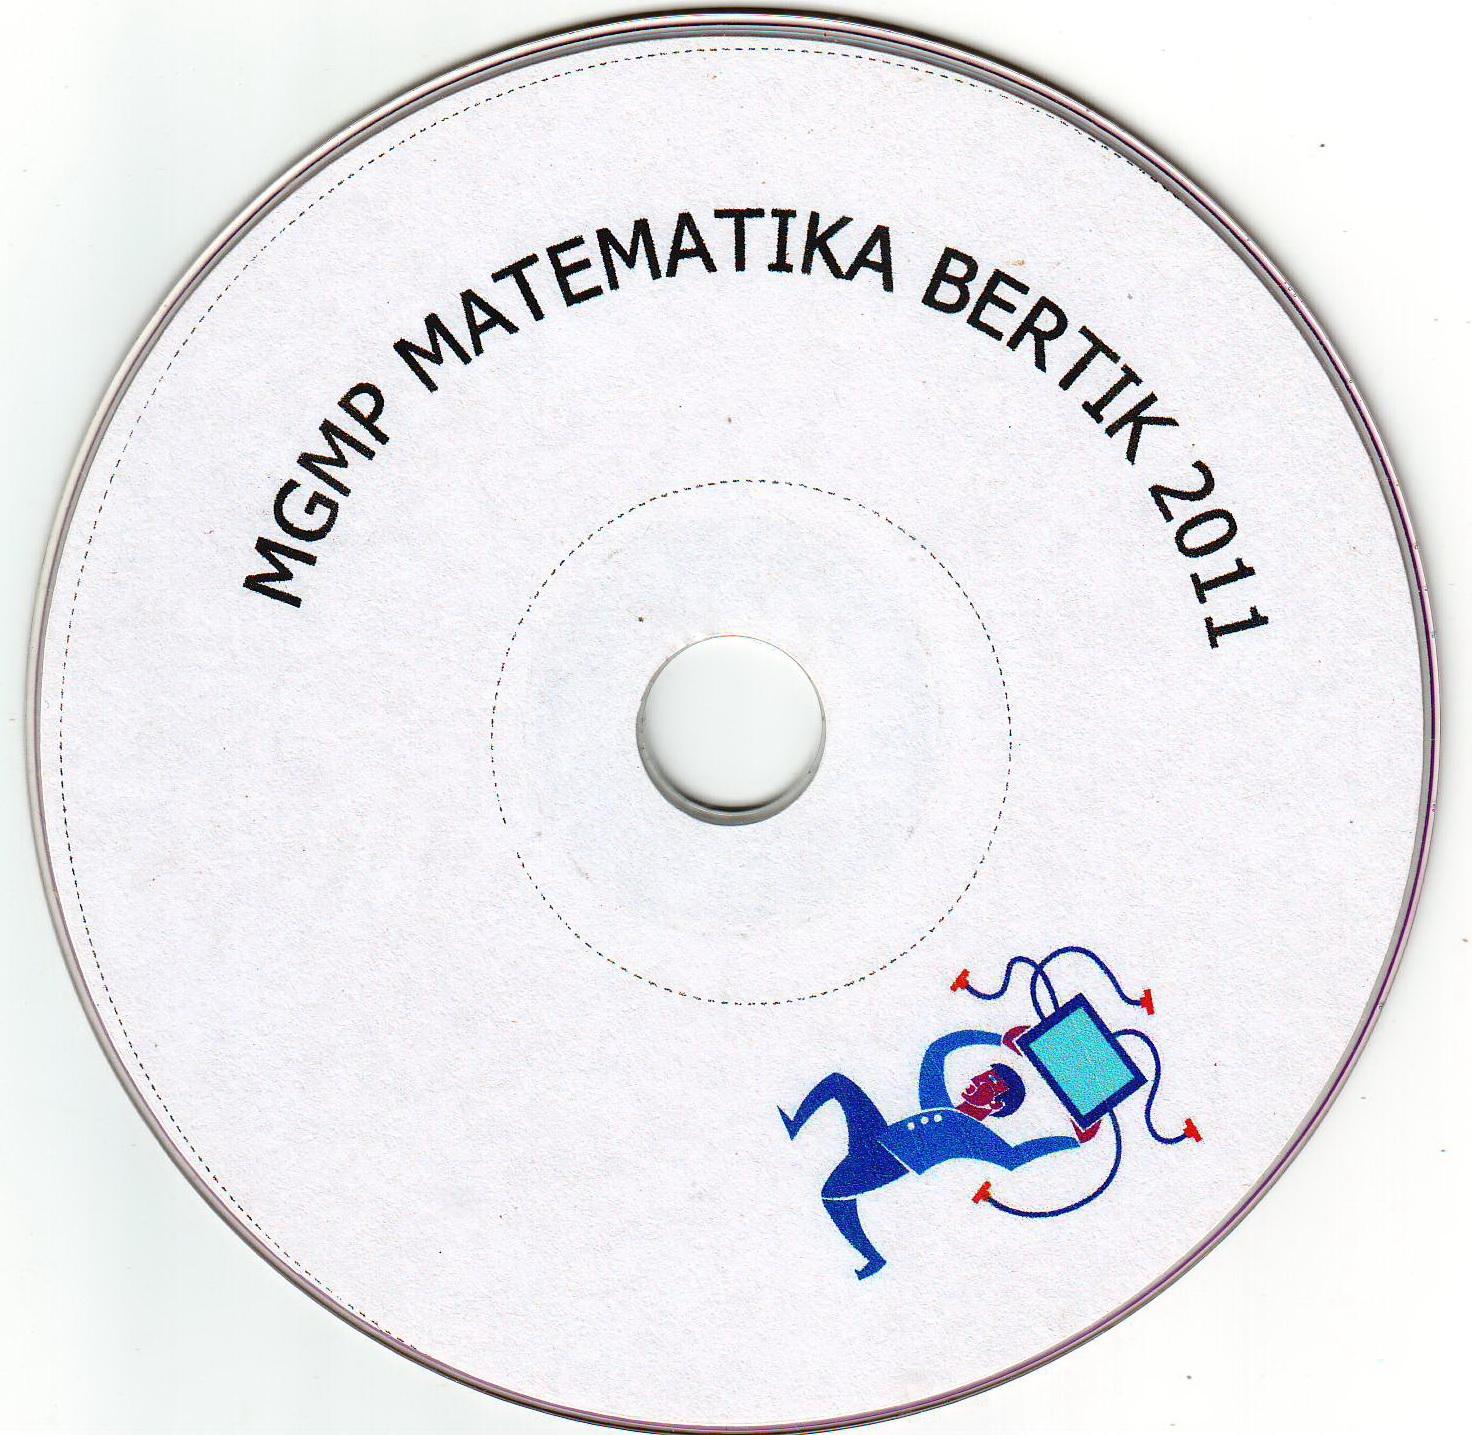 cd-label20001.jpg